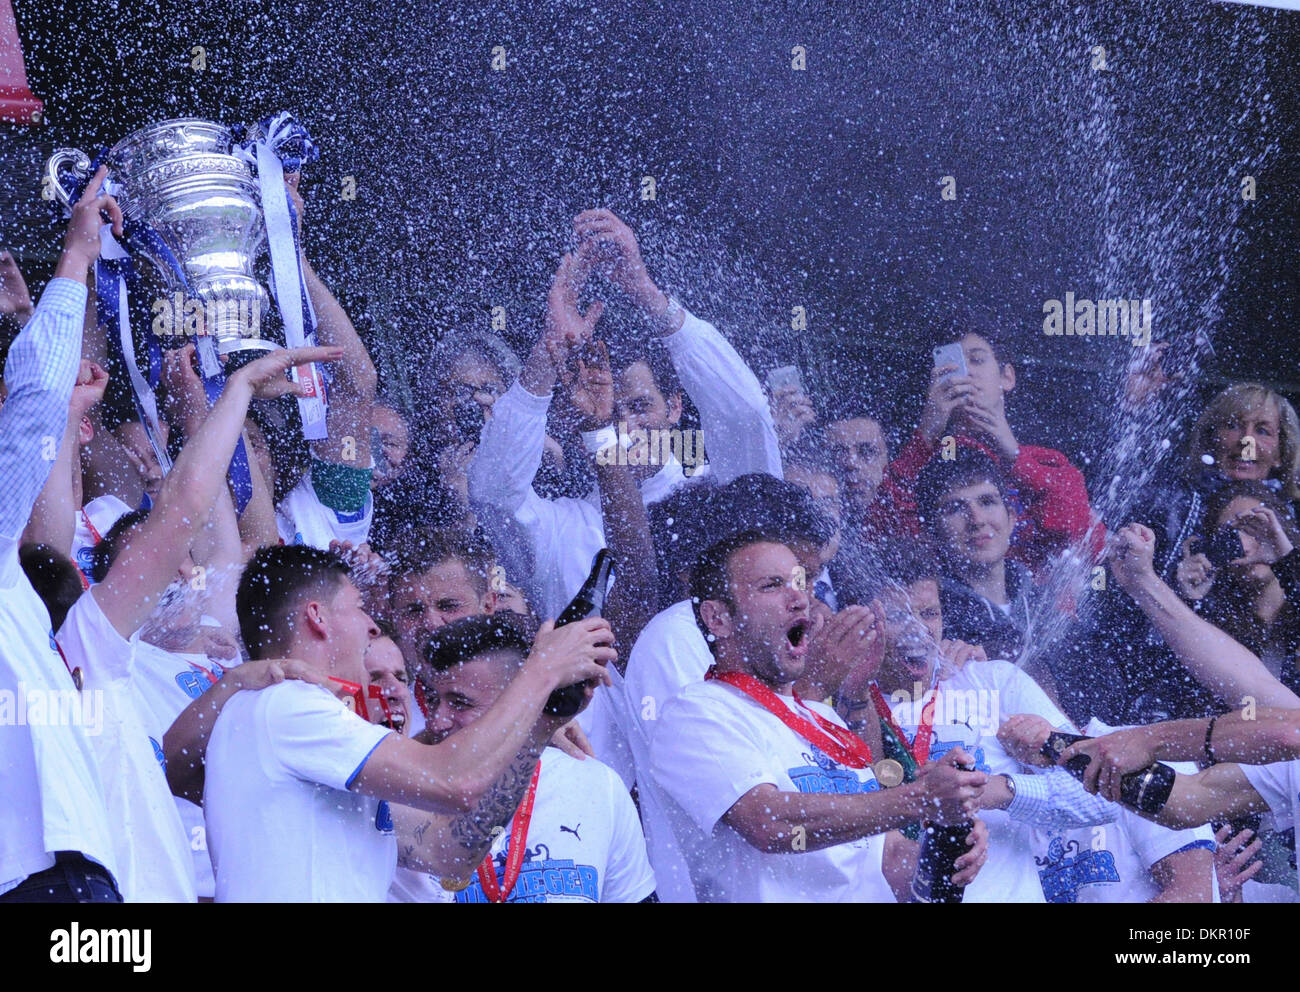 Football, Soccer, sport, Switzerland, cup, Final, trophy, Stade de Suisse, Bern, team, GC, winner, celebration, champagne - Stock Image